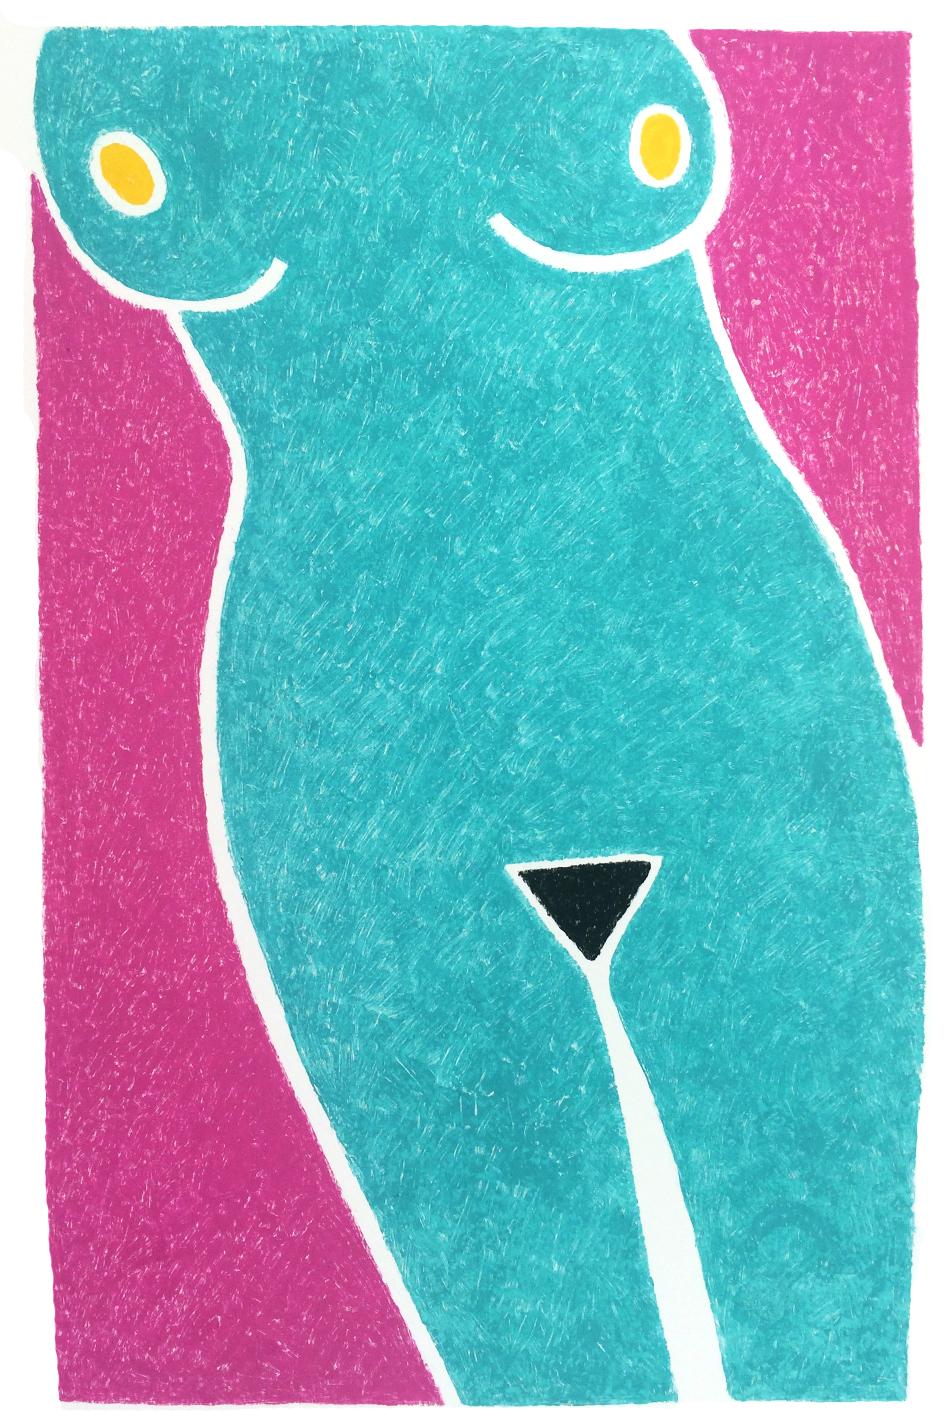 Bermuda Triangle  Monotype * SOLD